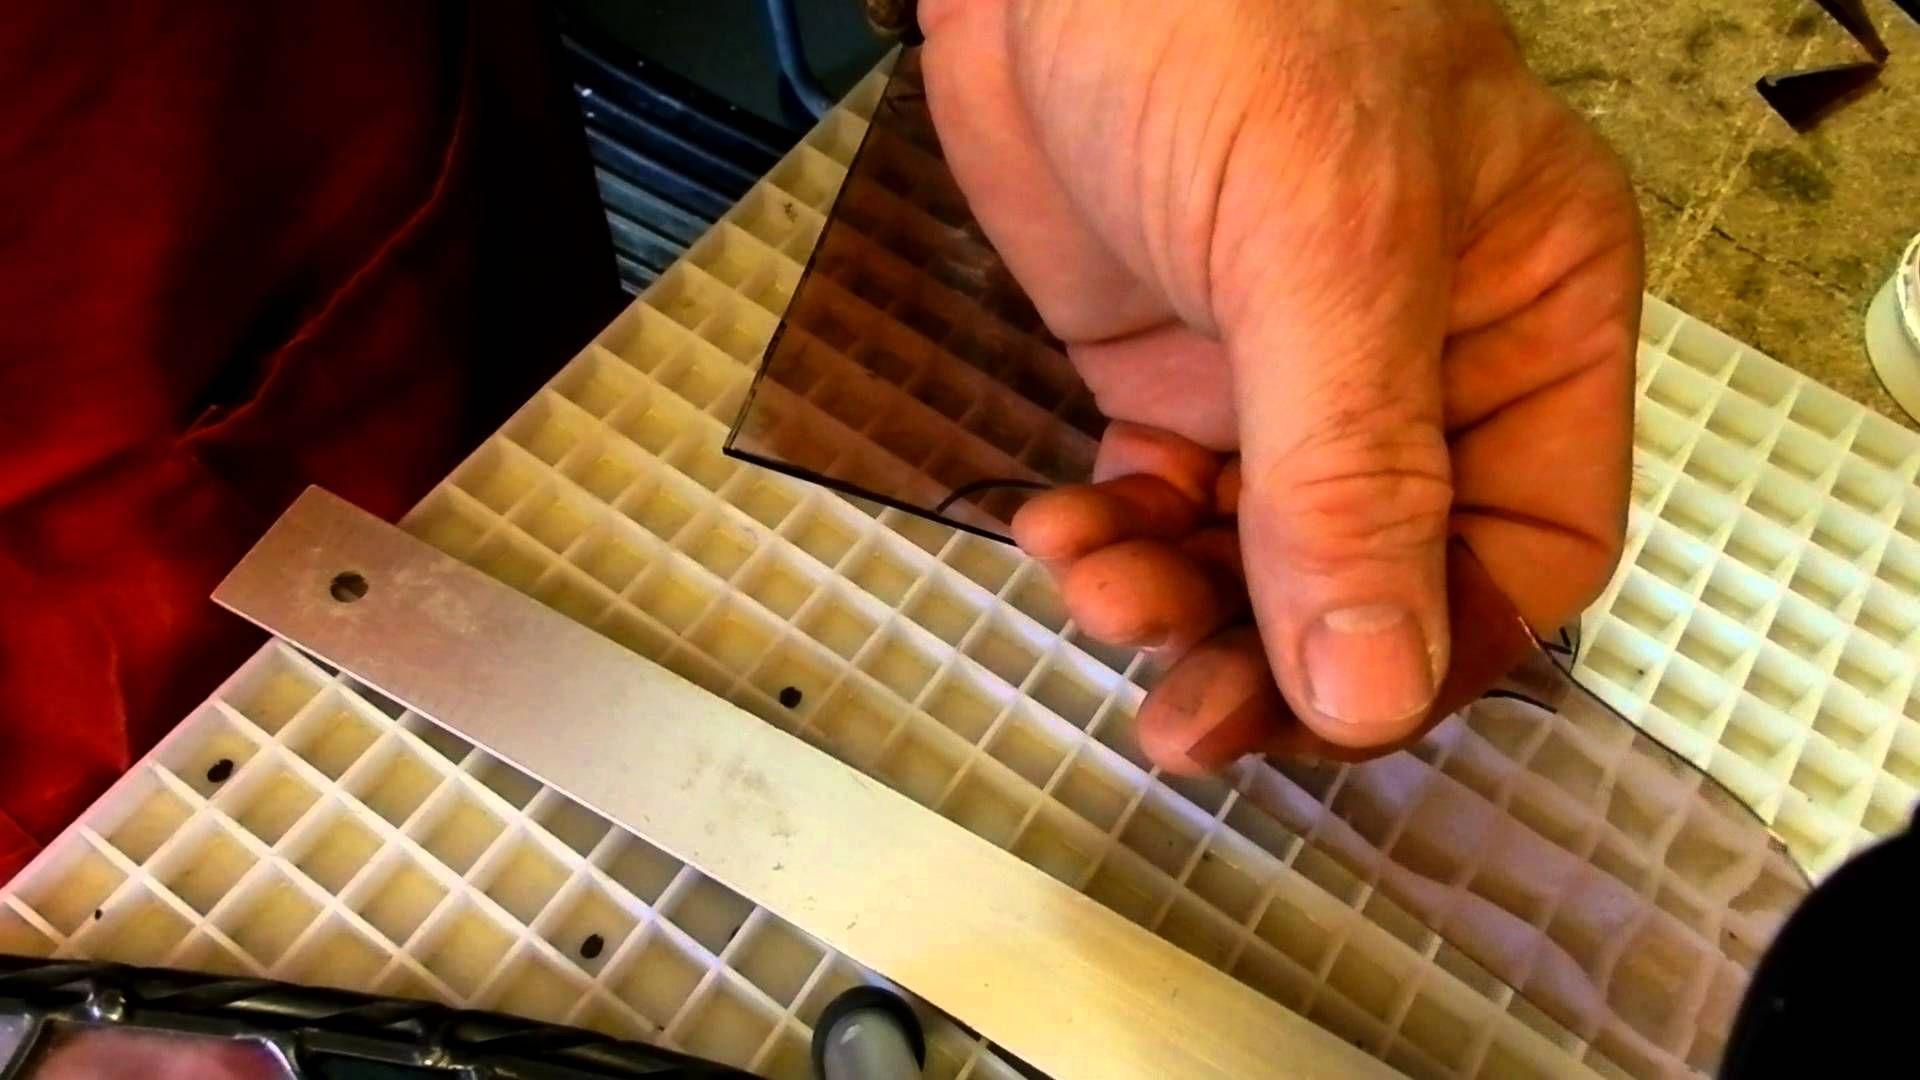 stained glass repair job 1b.MOV #glassrepair